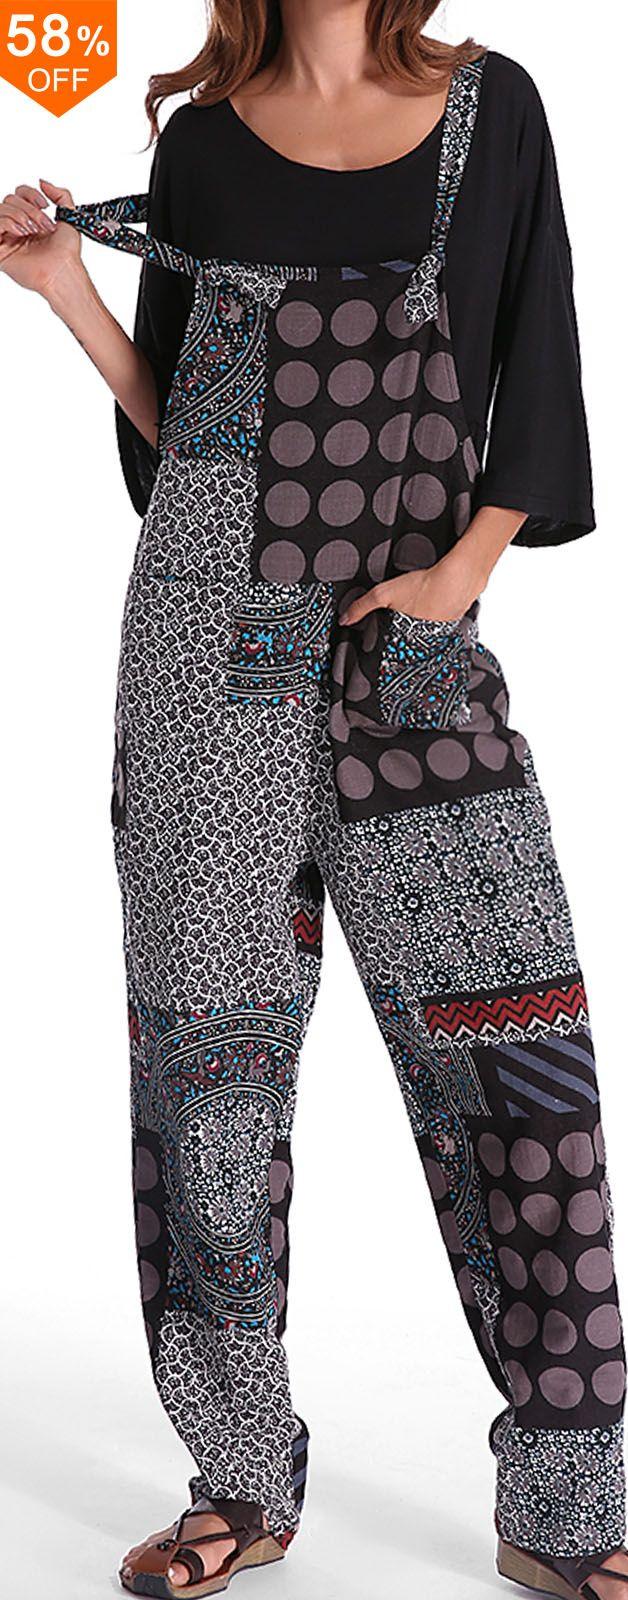 Gracila Casual Women Polka Dot Printed Loose Patchwork Pocket Jumpsuits.Casual S... 13